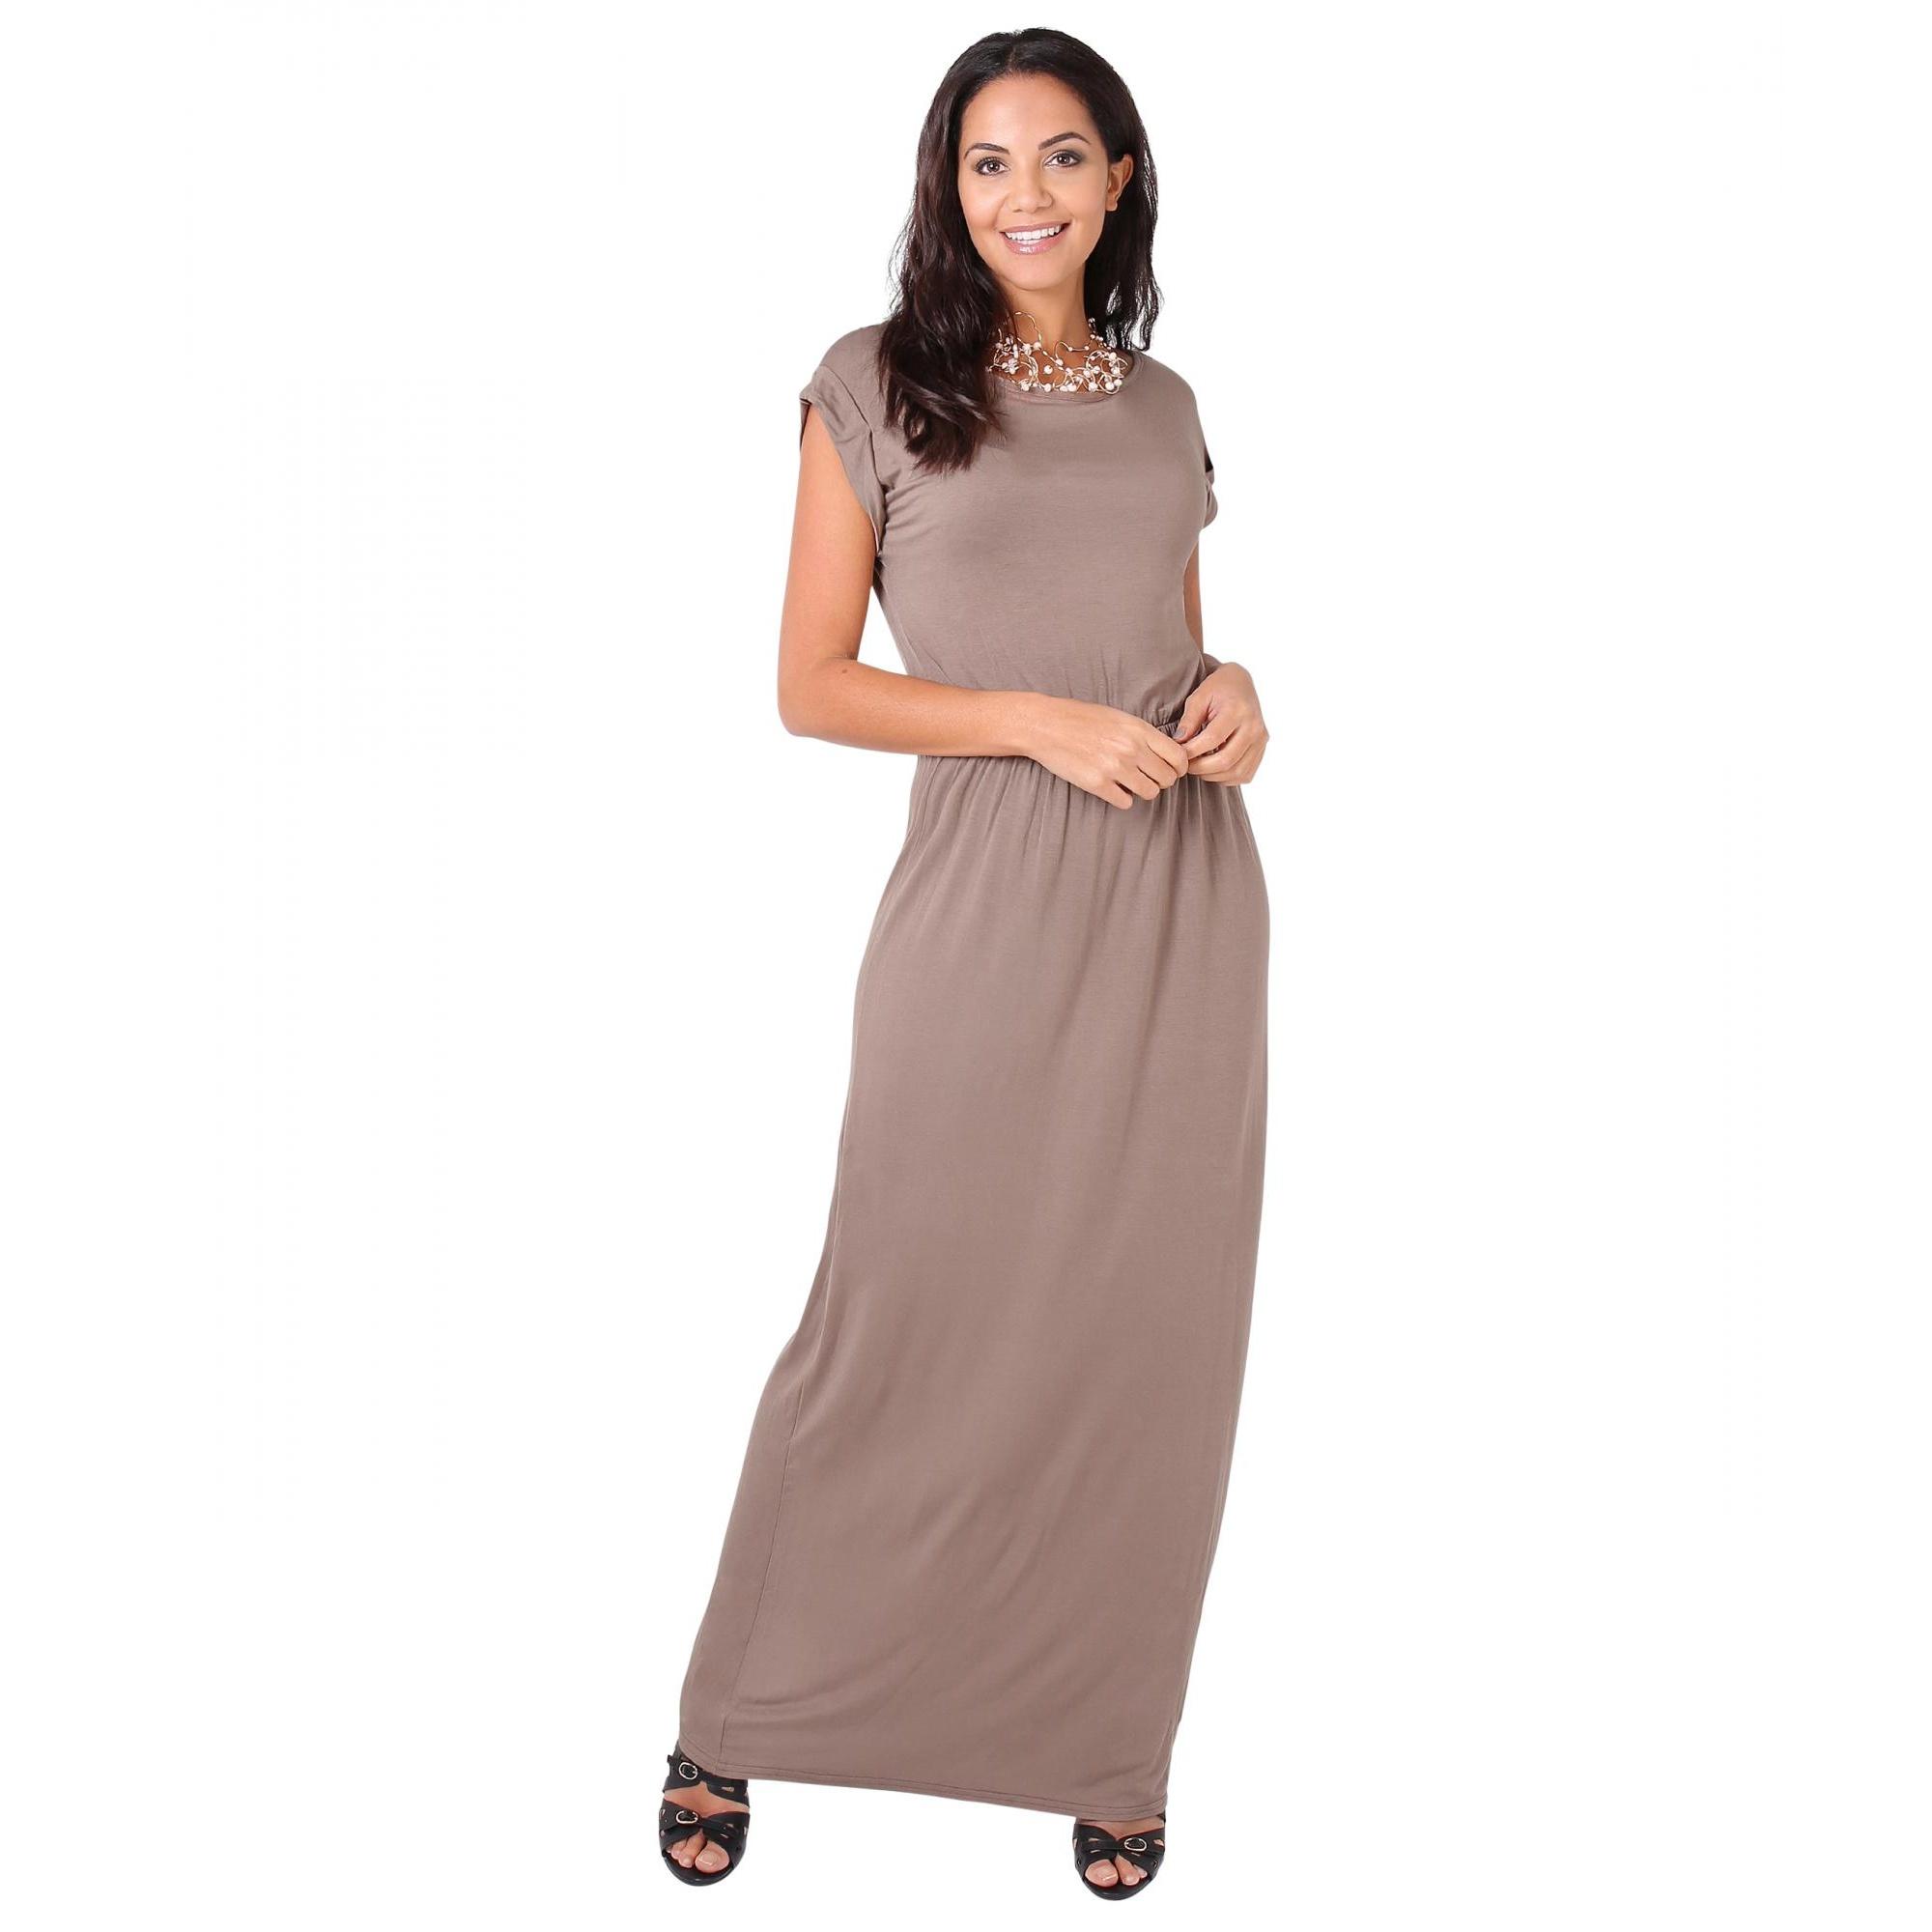 Krisp Womens/Ladies Turn Up Sleeve Jersey Maxi Dress (20 UK) (Mocha)